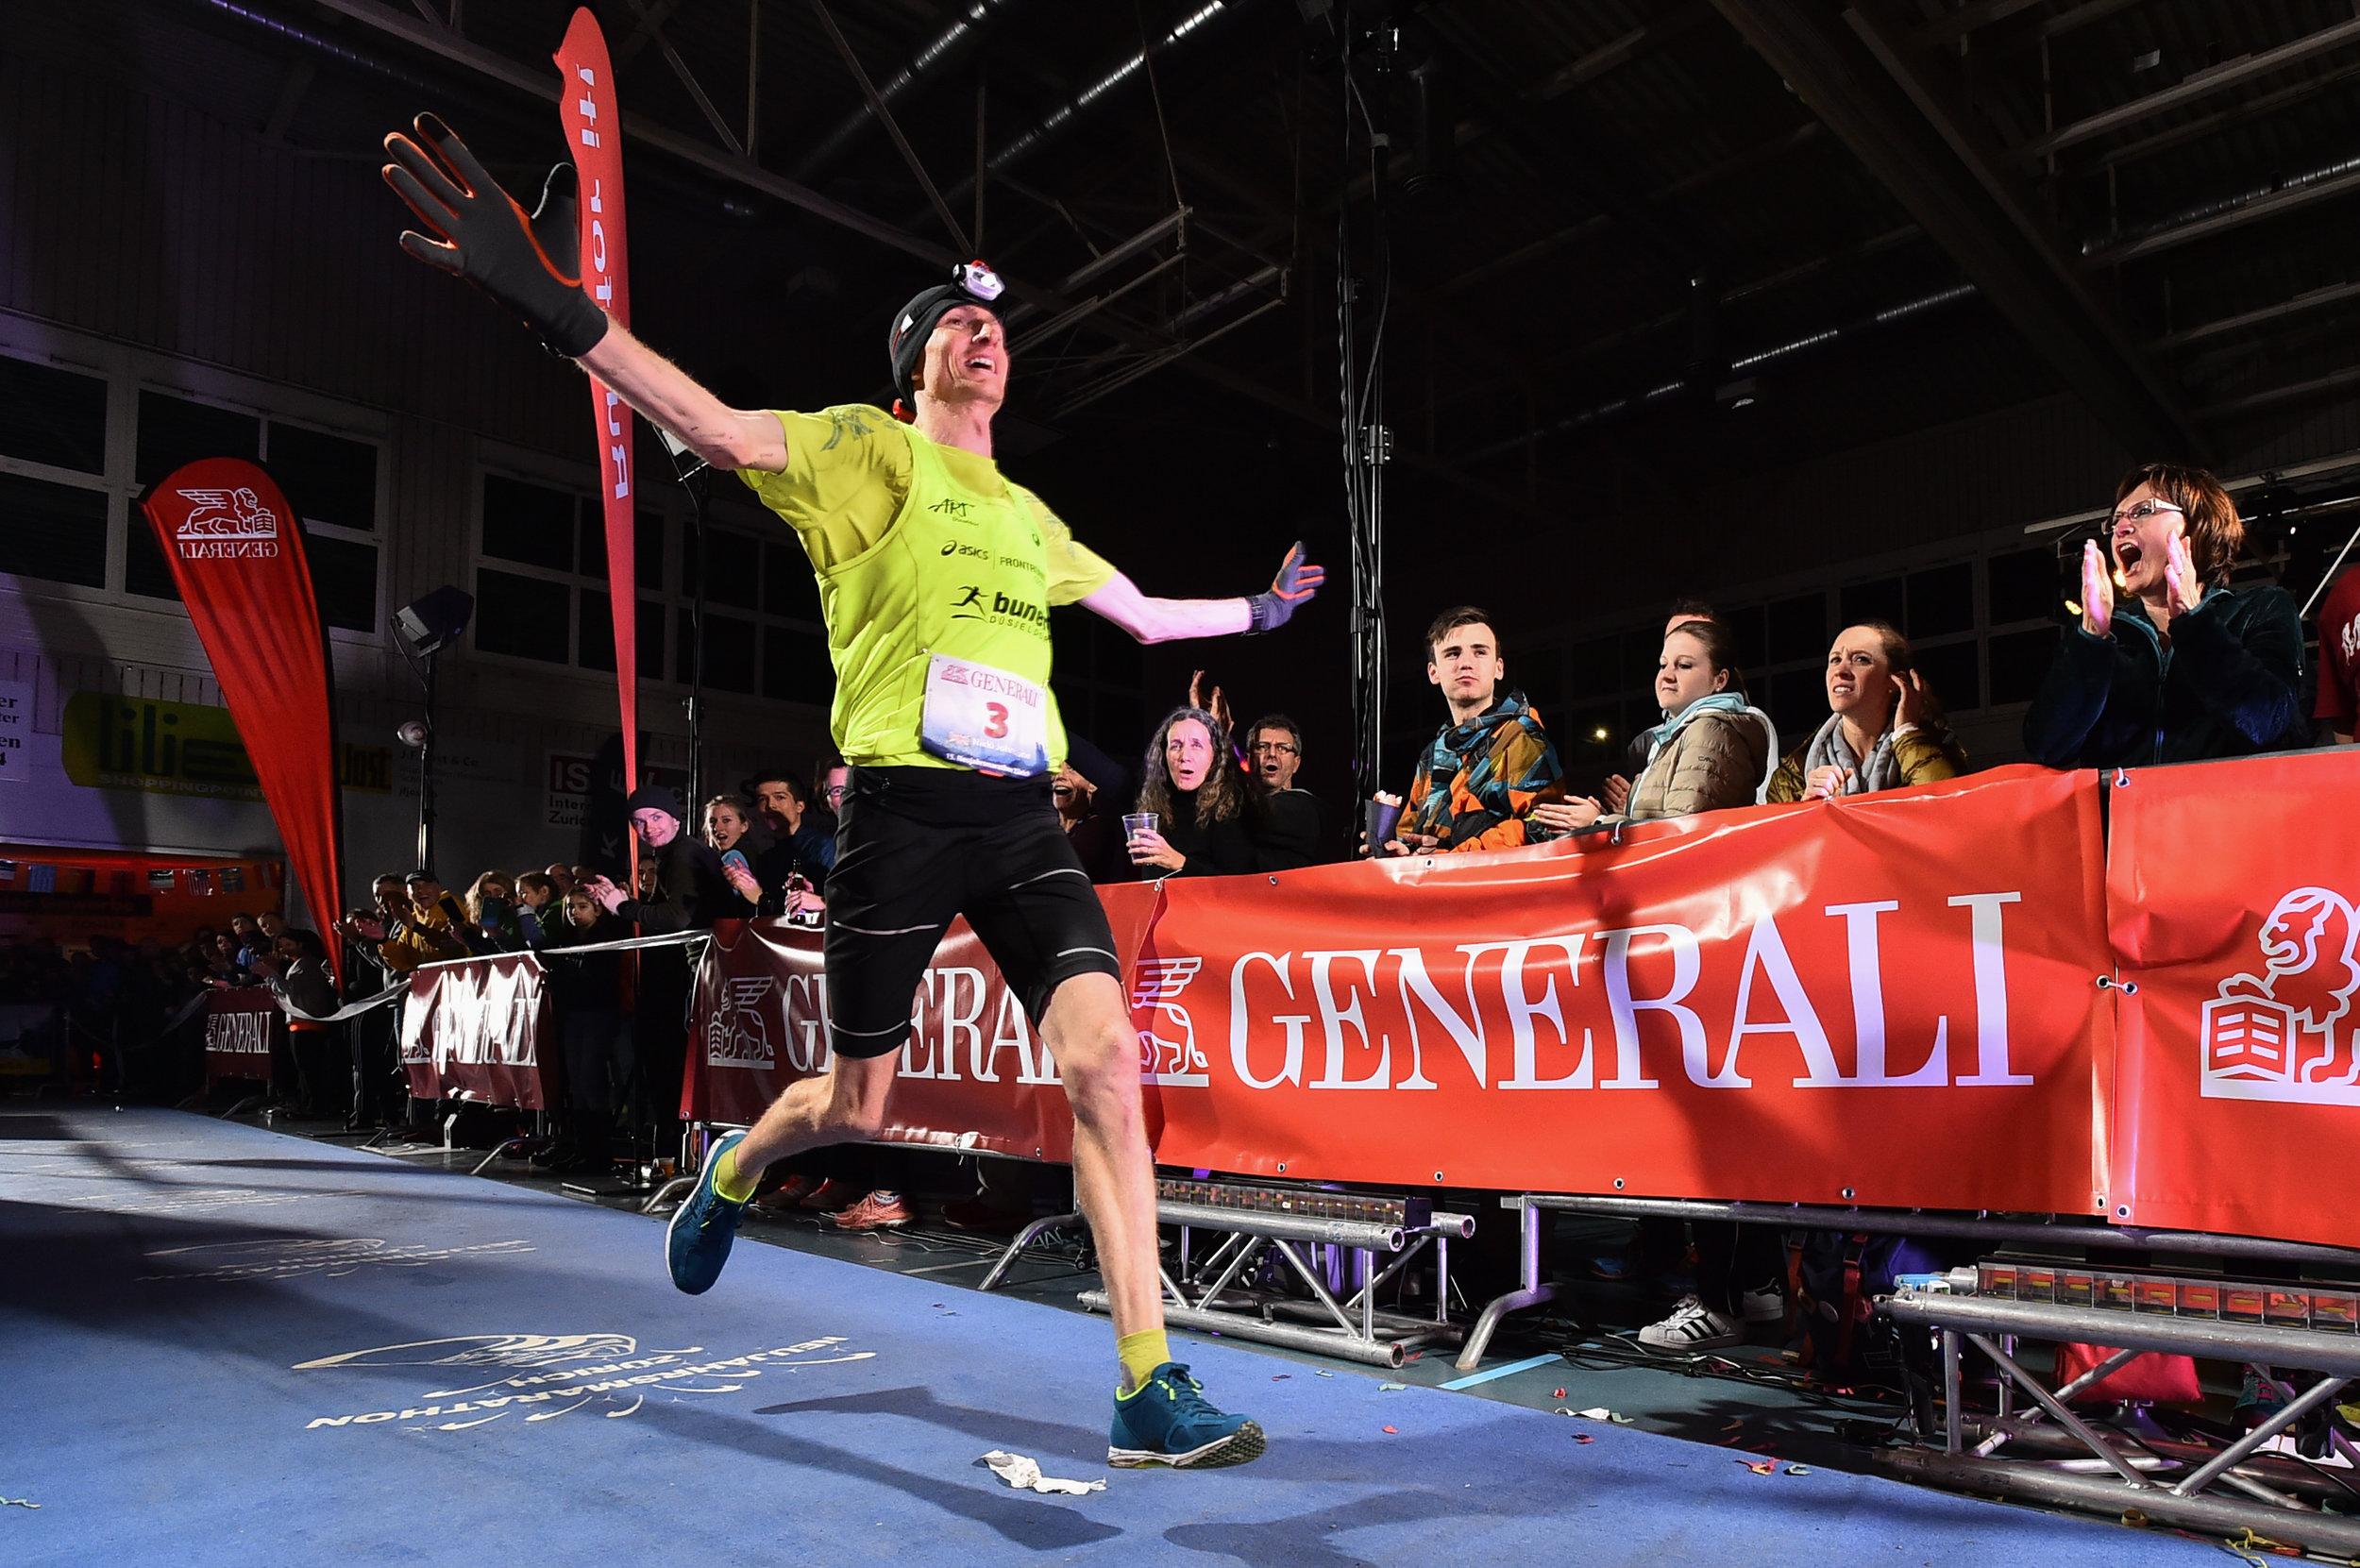 Marathonsieger Nikki Johnstone